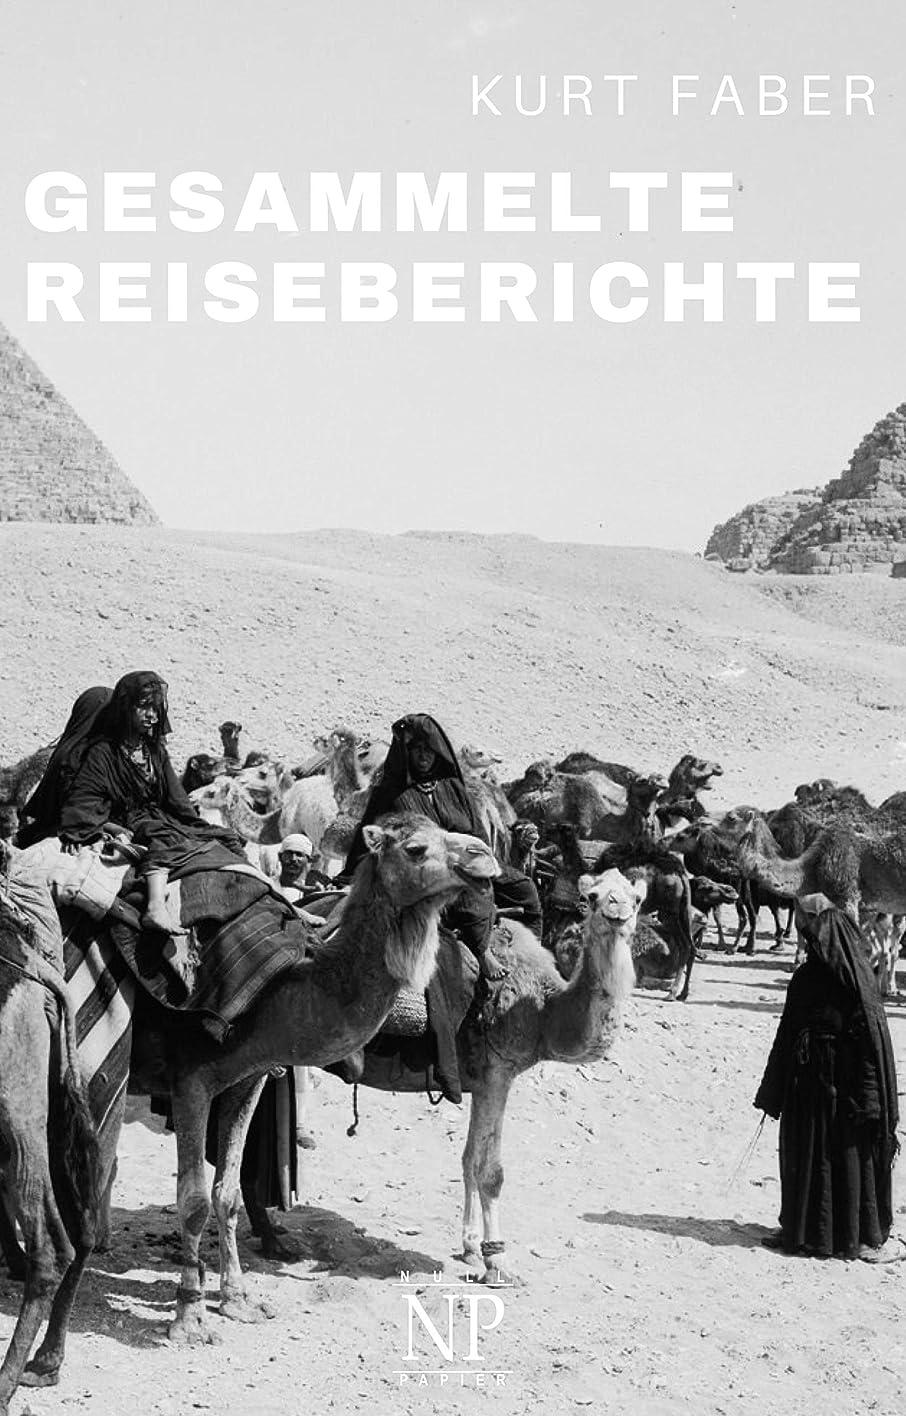 ピン幅メディアGesammelte Reiseberichte: Reisen zu Beginn des 20. Jahrhunderts (Gesammelte Werke bei Null Papier) (German Edition)